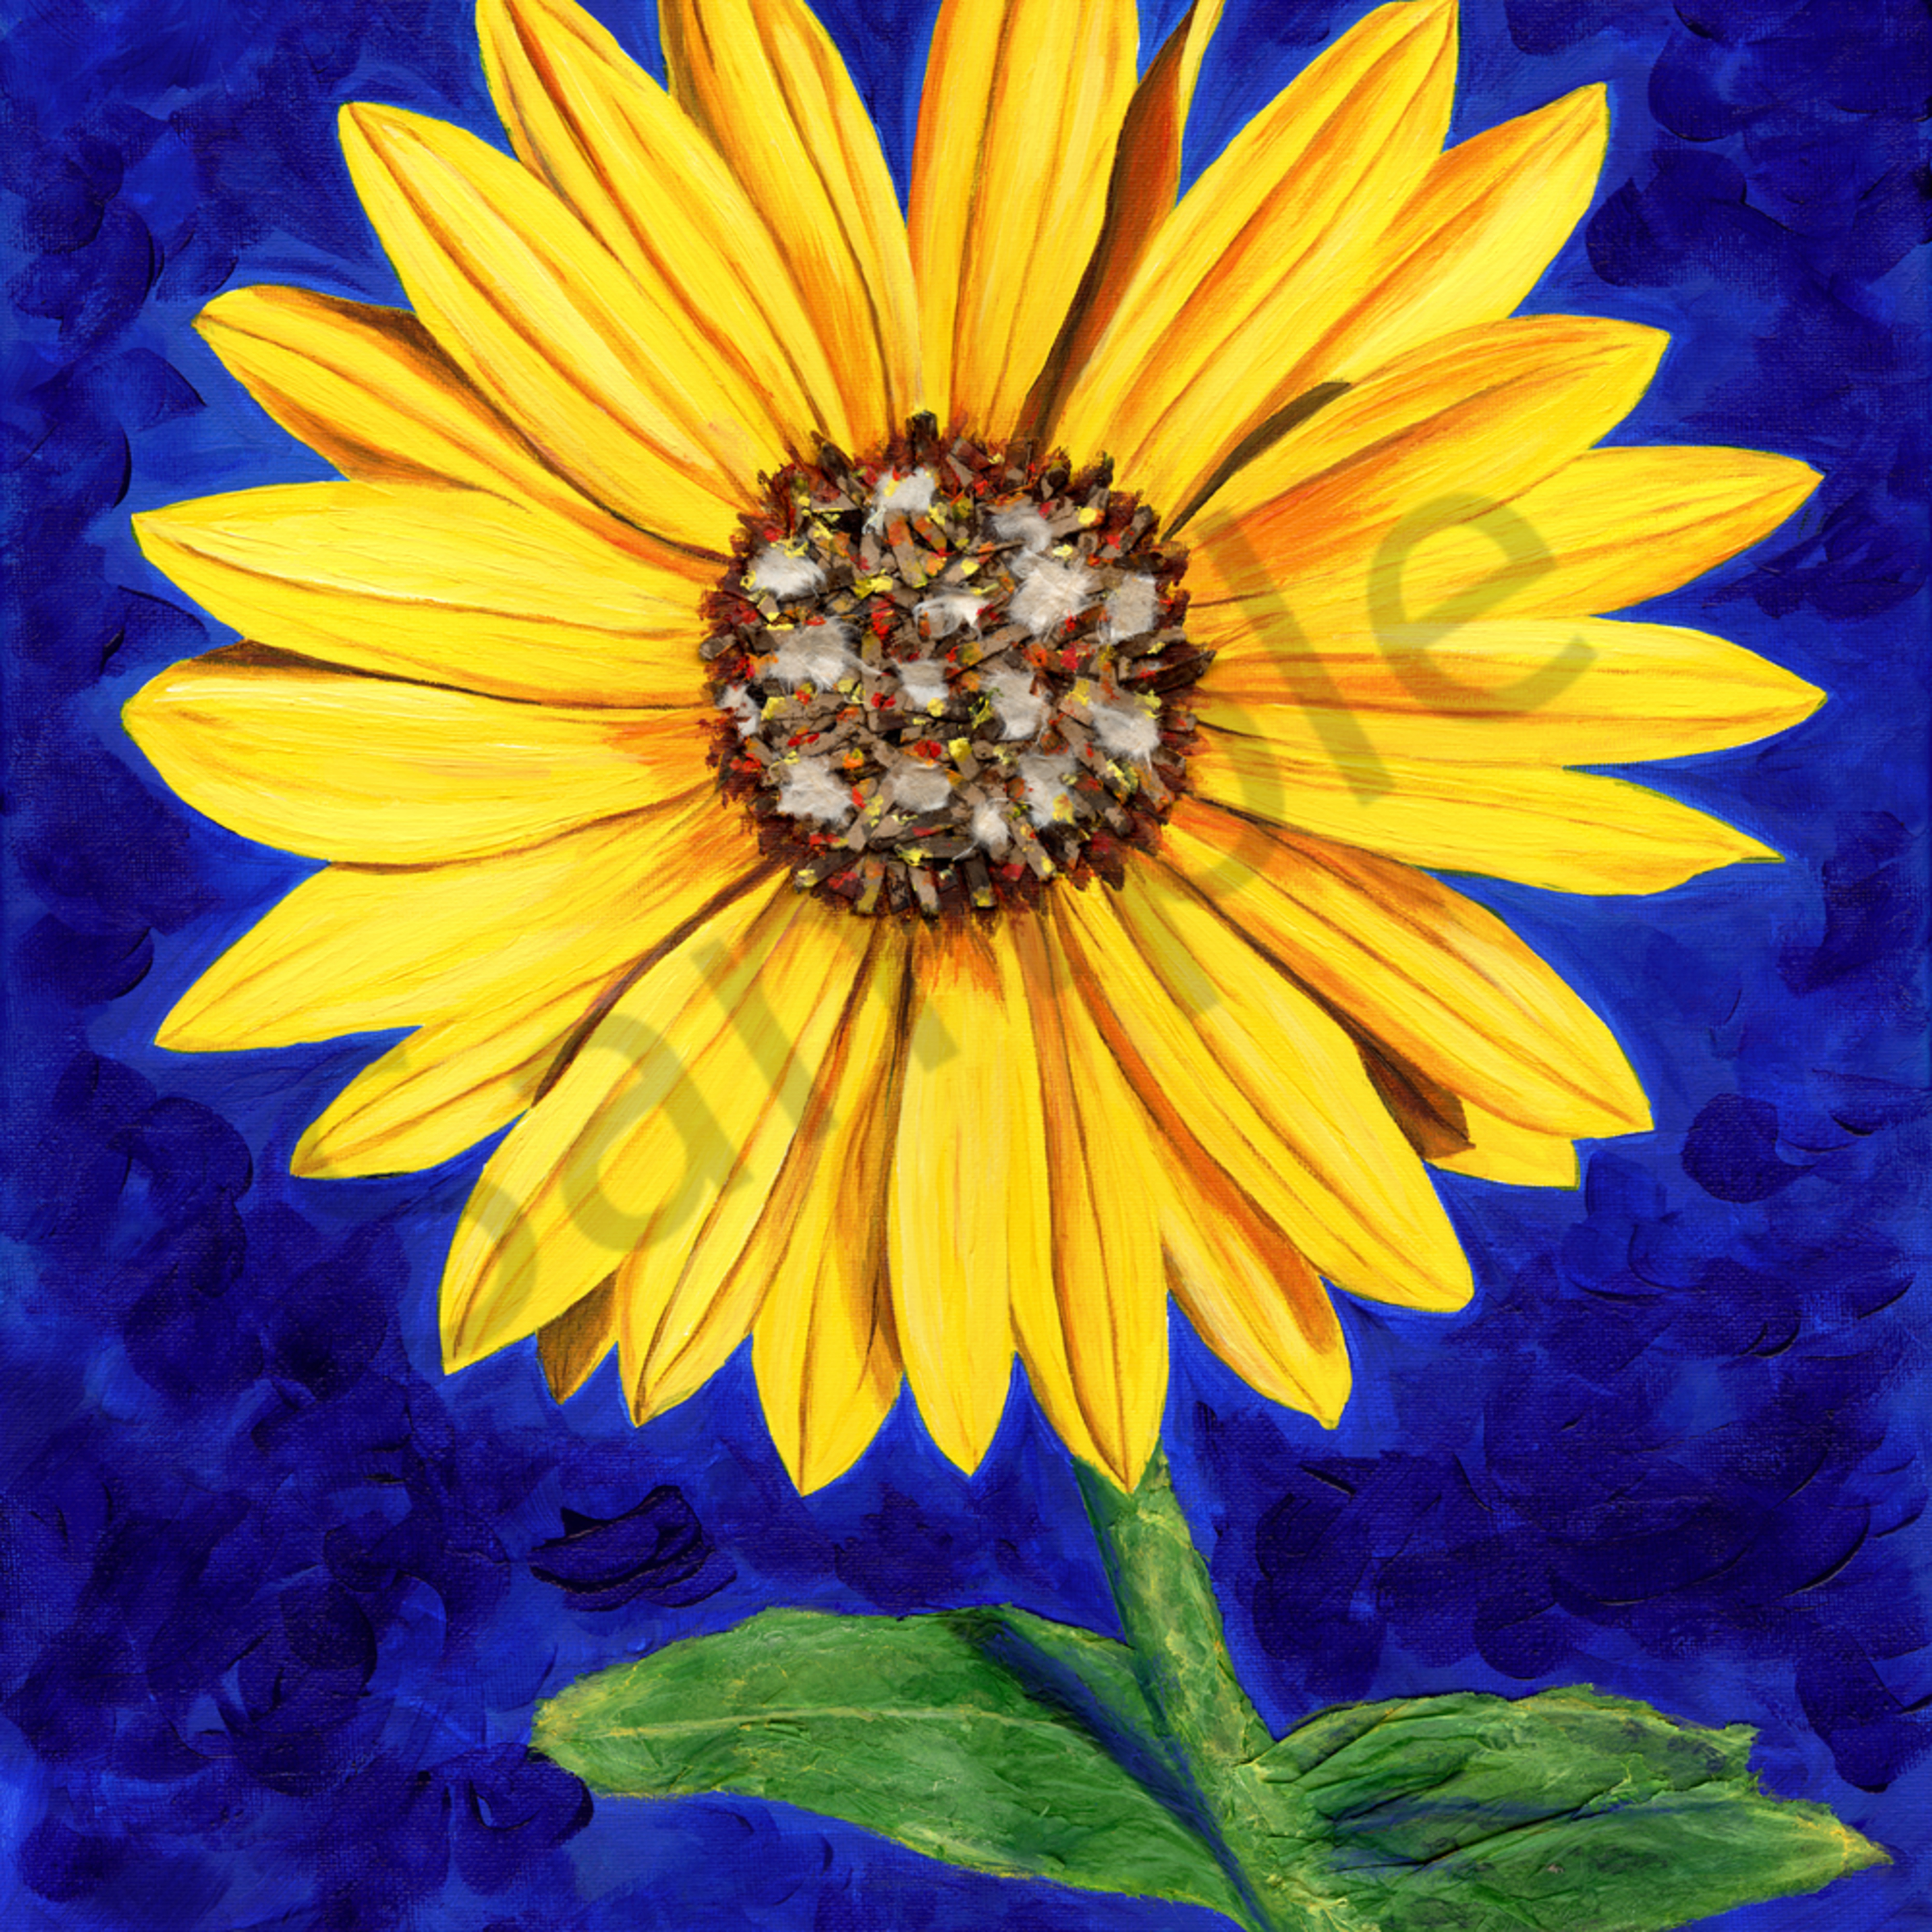 Sassy sunflower 600 eqxils